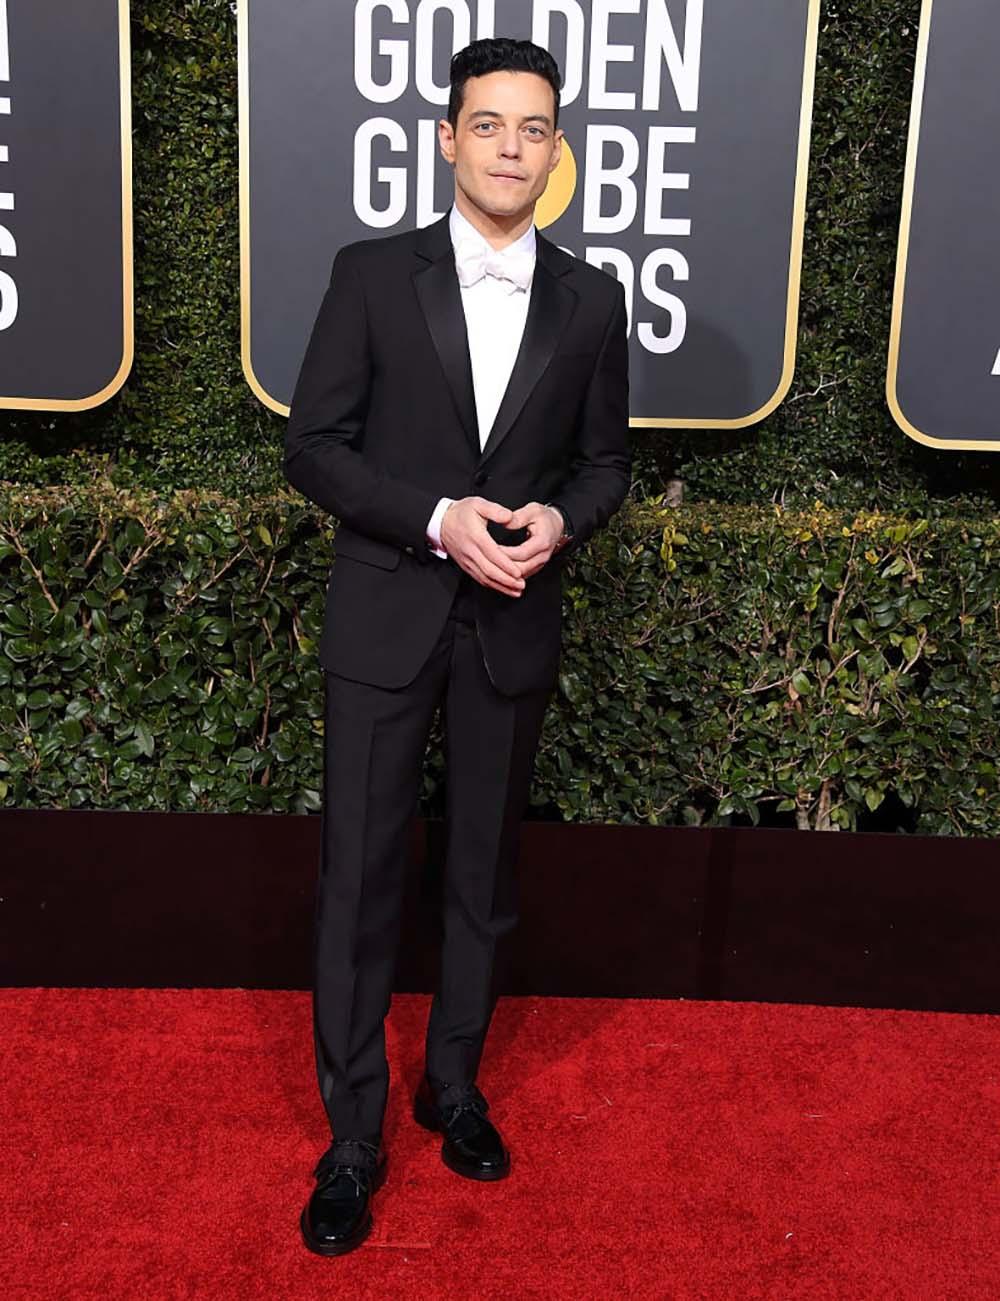 Rami-Malek-Golden-Globes